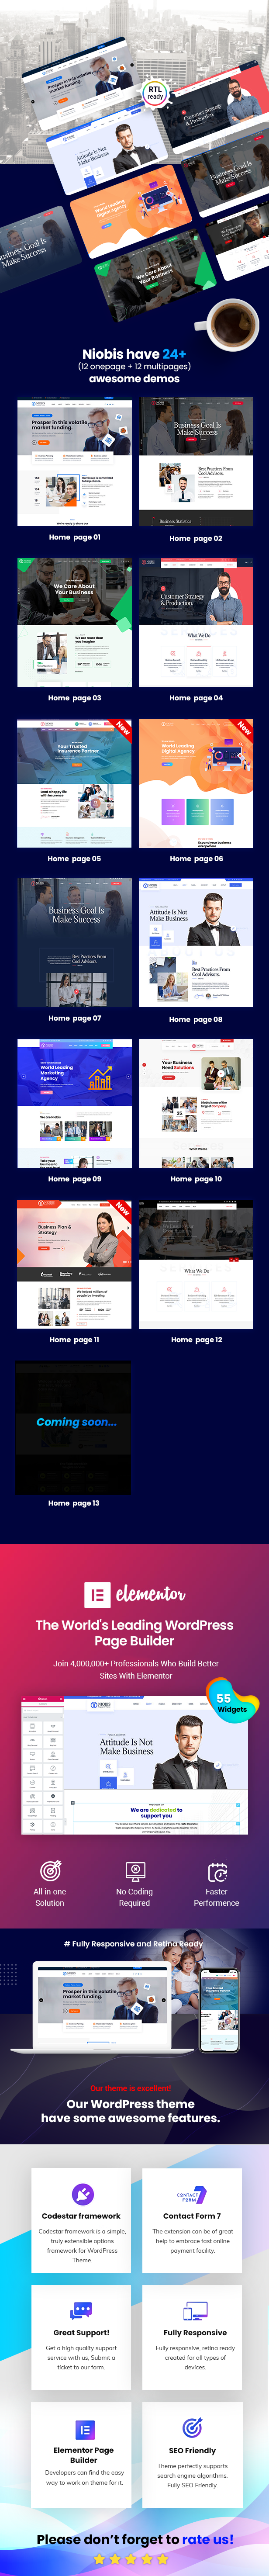 NioBis - Business Consulting - 1